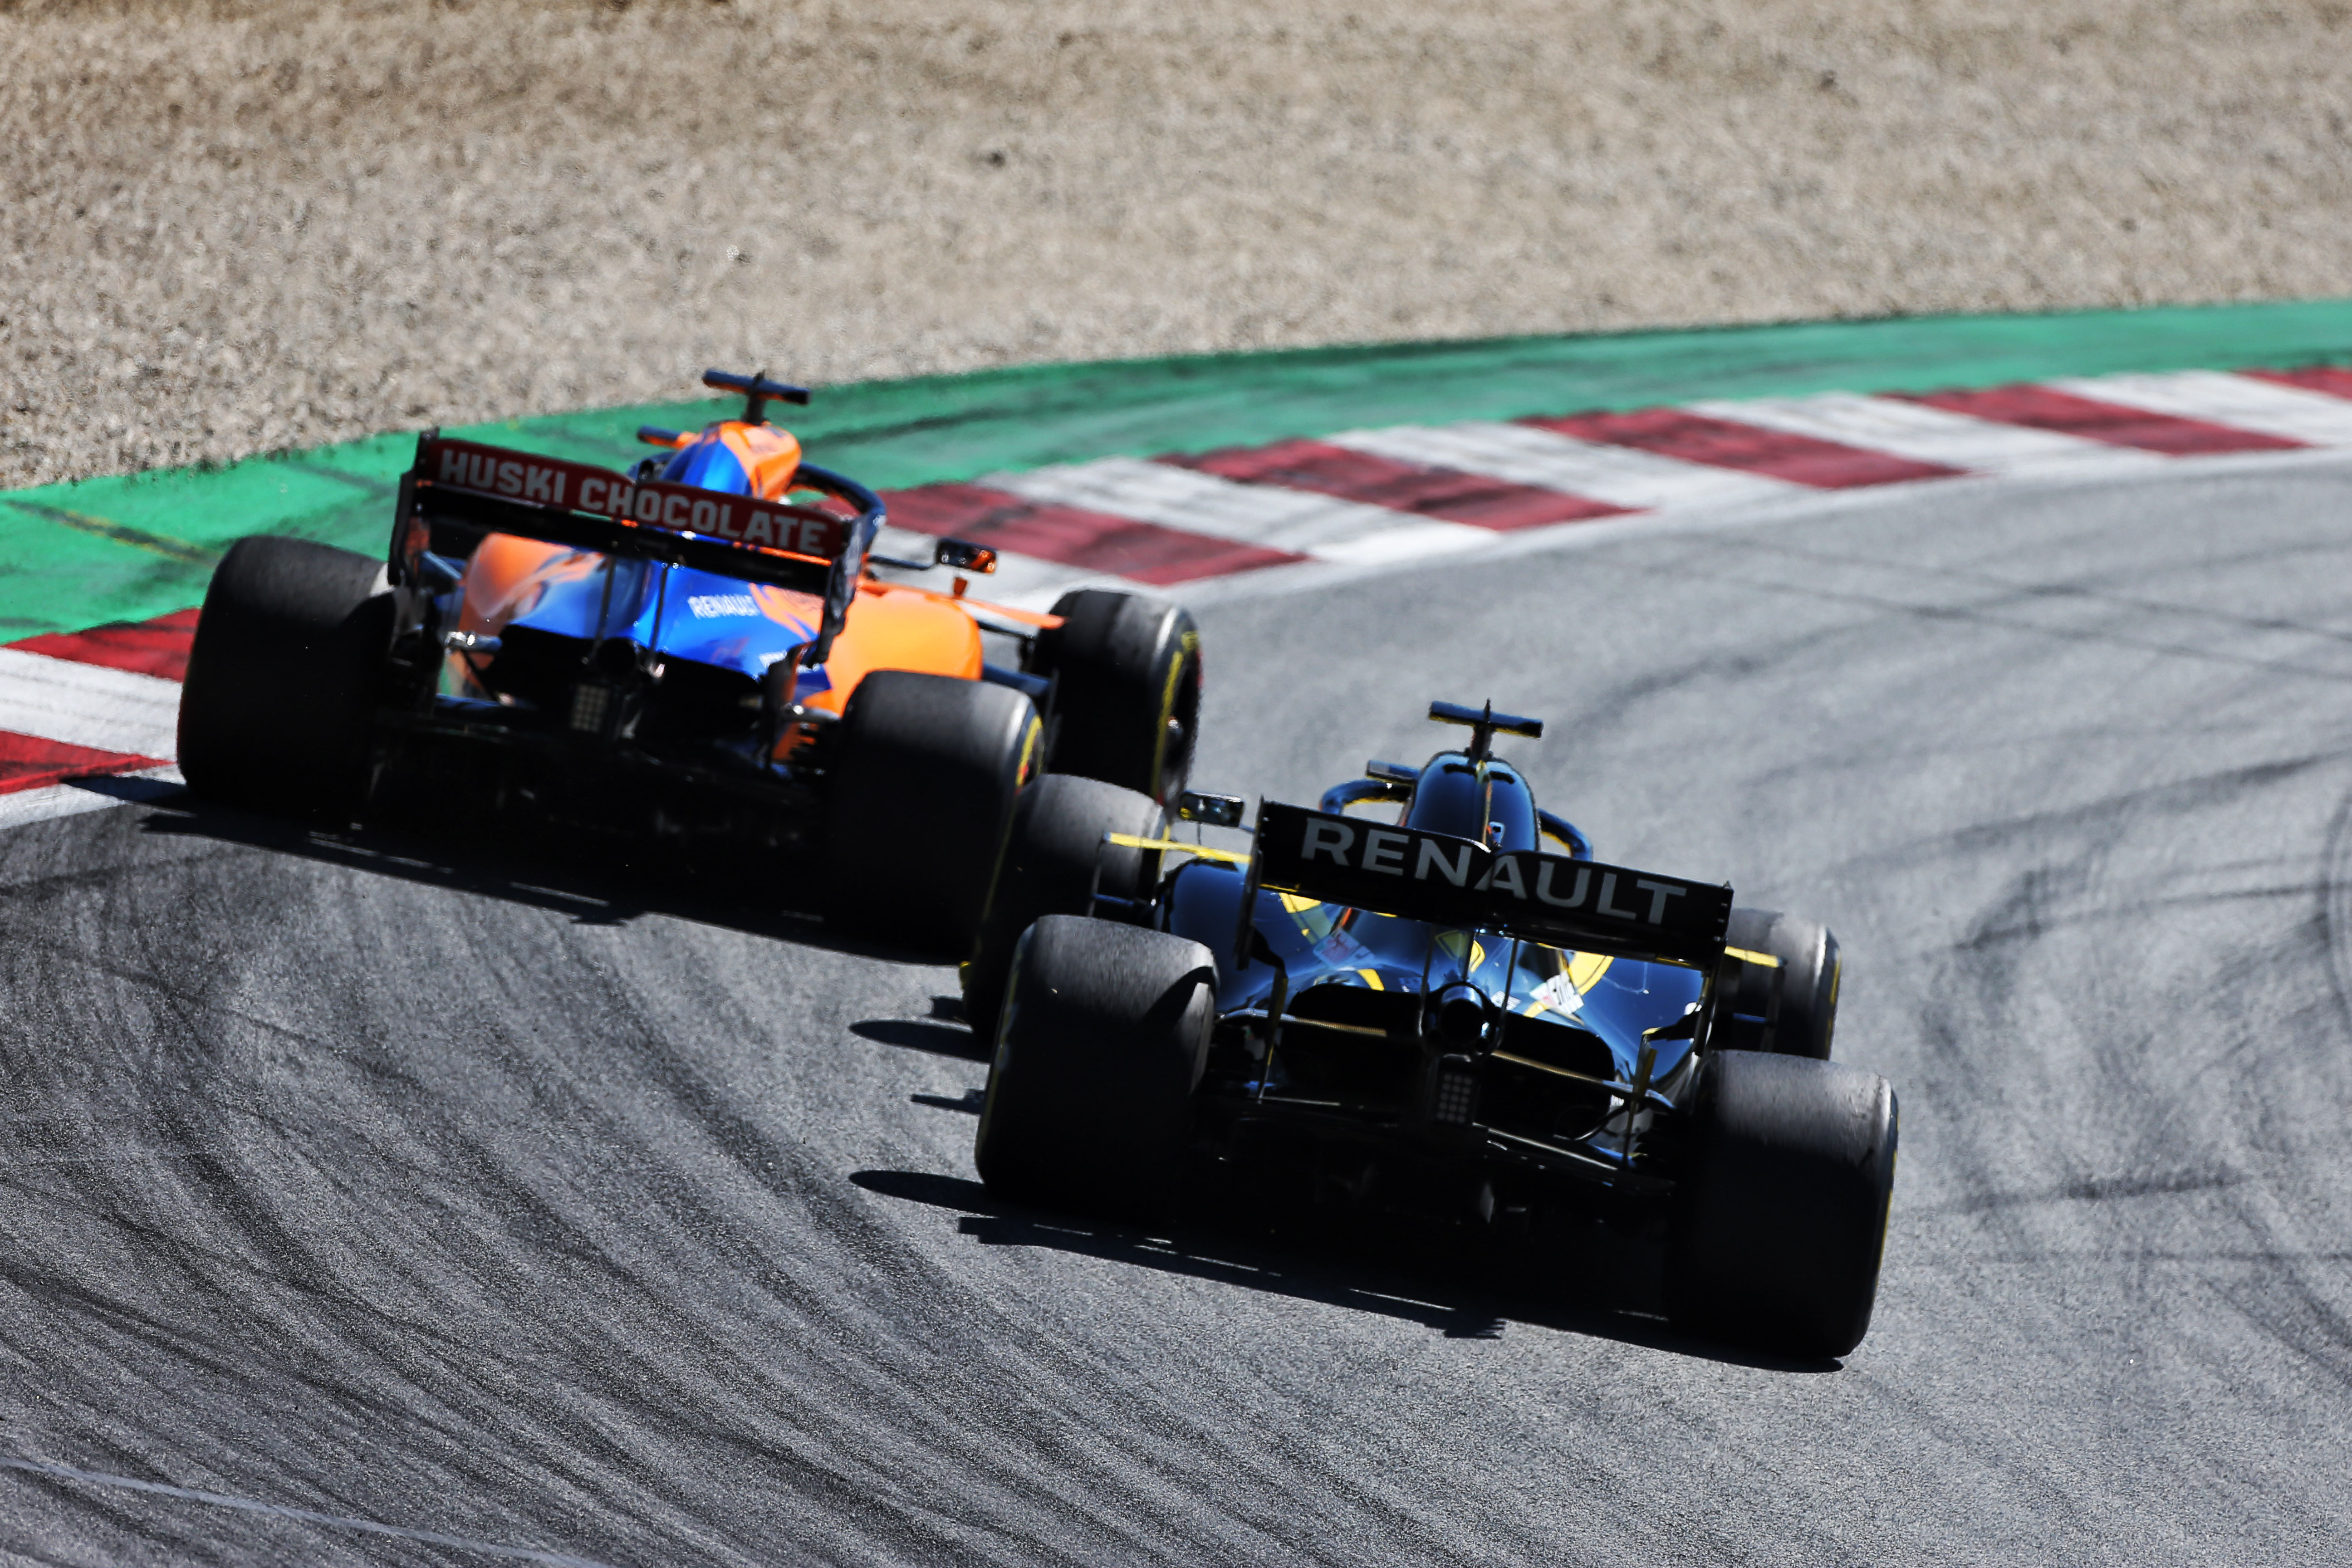 Carlos Sainz Jr McLaren Daniel Ricciardo Renault Austrian Grand Prix 2019